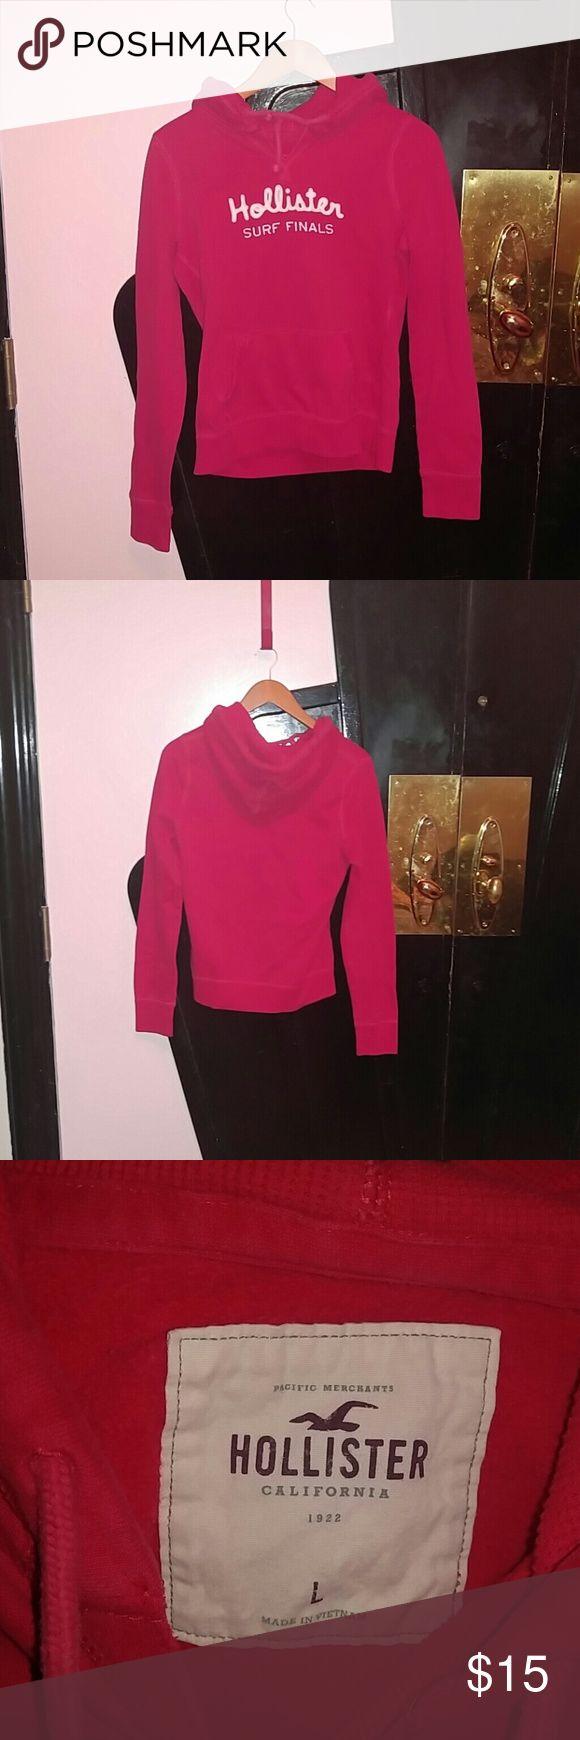 Hollister red woman's hoodie Woman's red Hollister hoodie in good condition Hollister Tops Sweatshirts & Hoodies